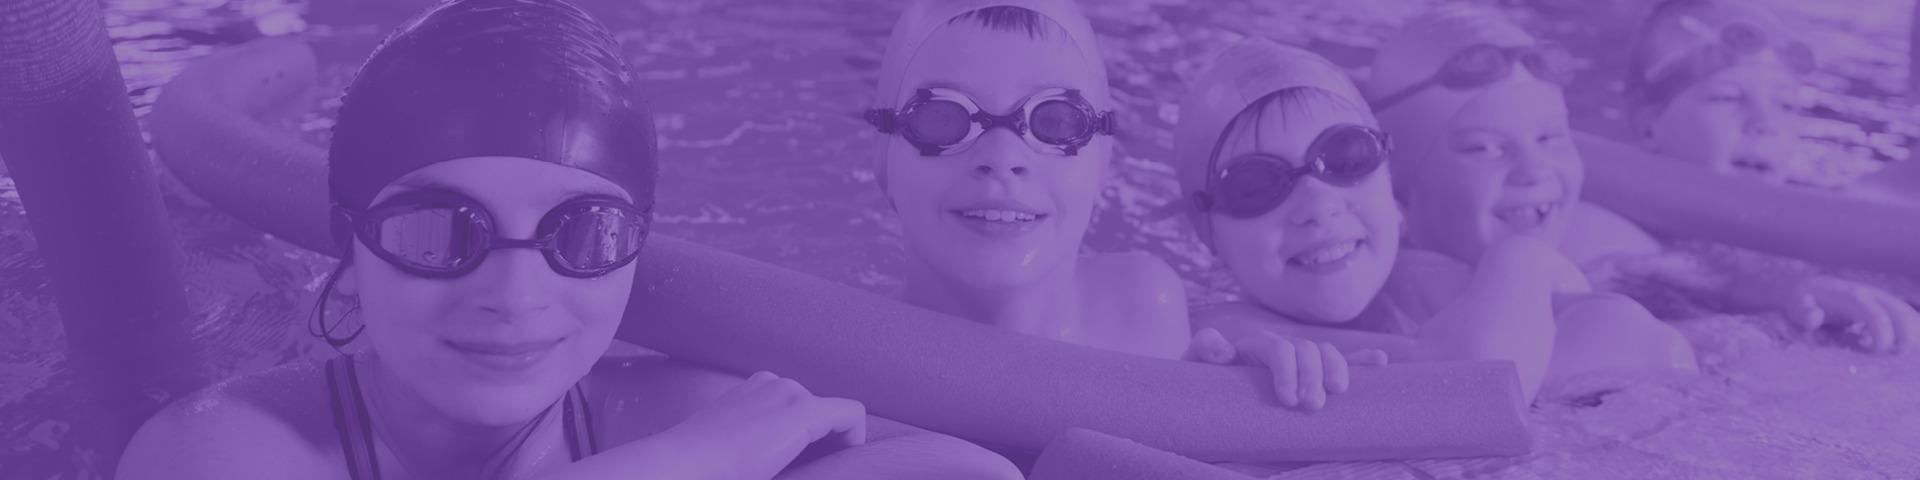 Rutland Swim Academy Case Study Header Image